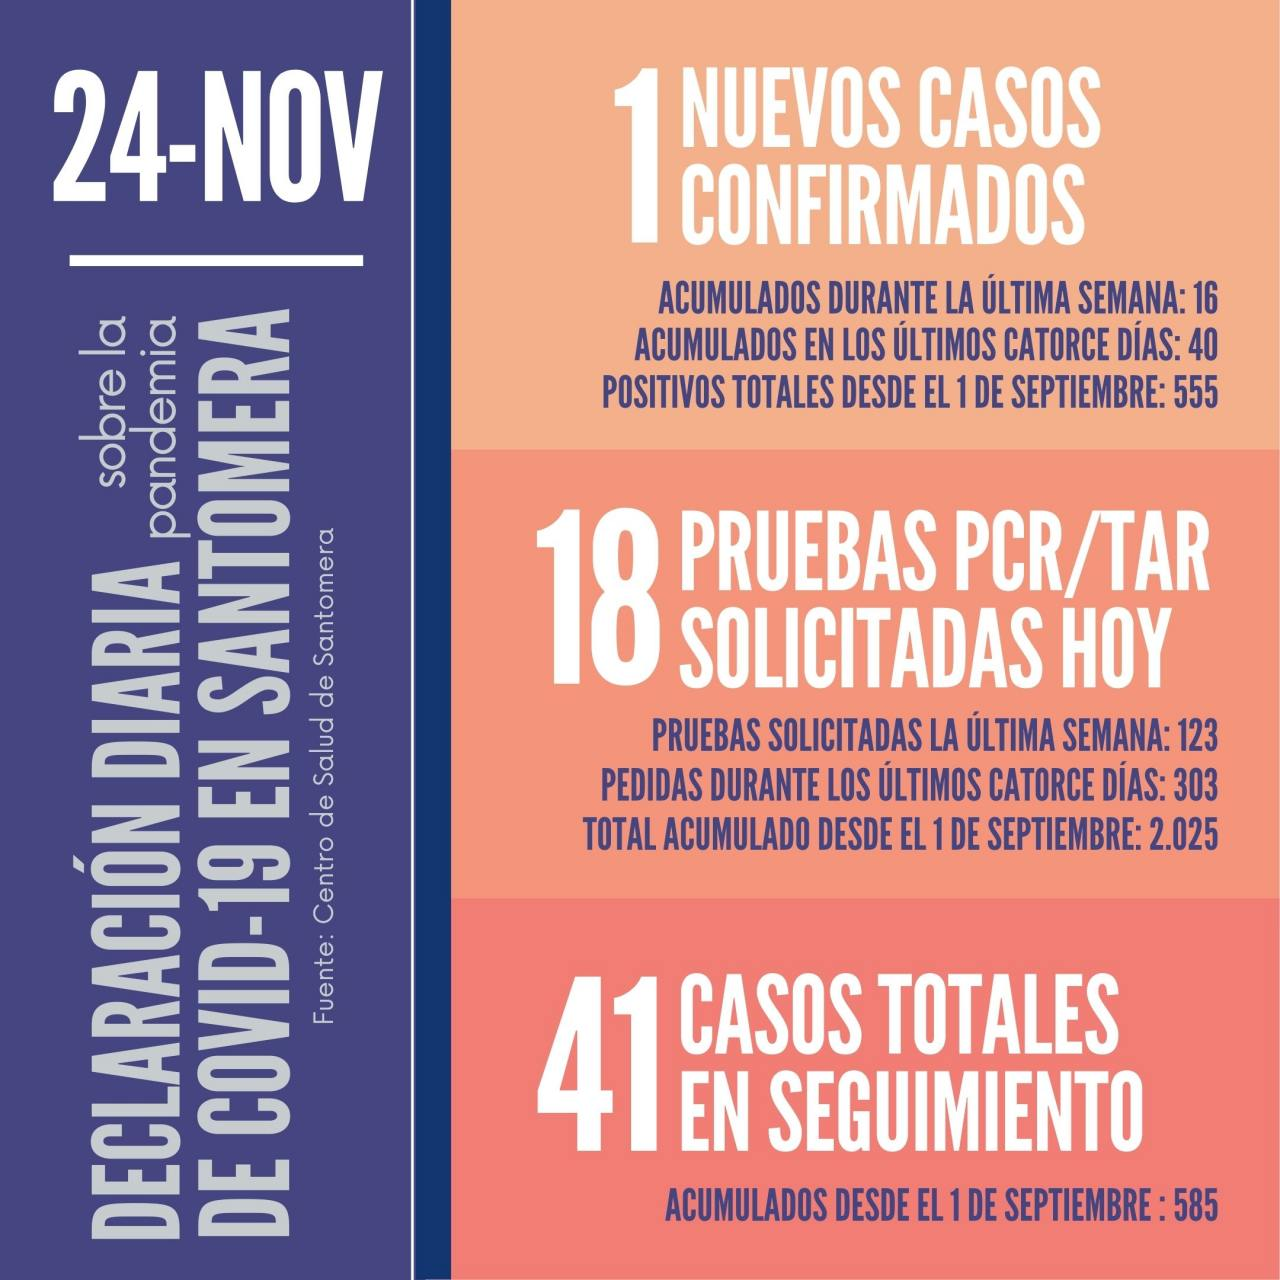 20201124_Datos-COVID-19-Santomera